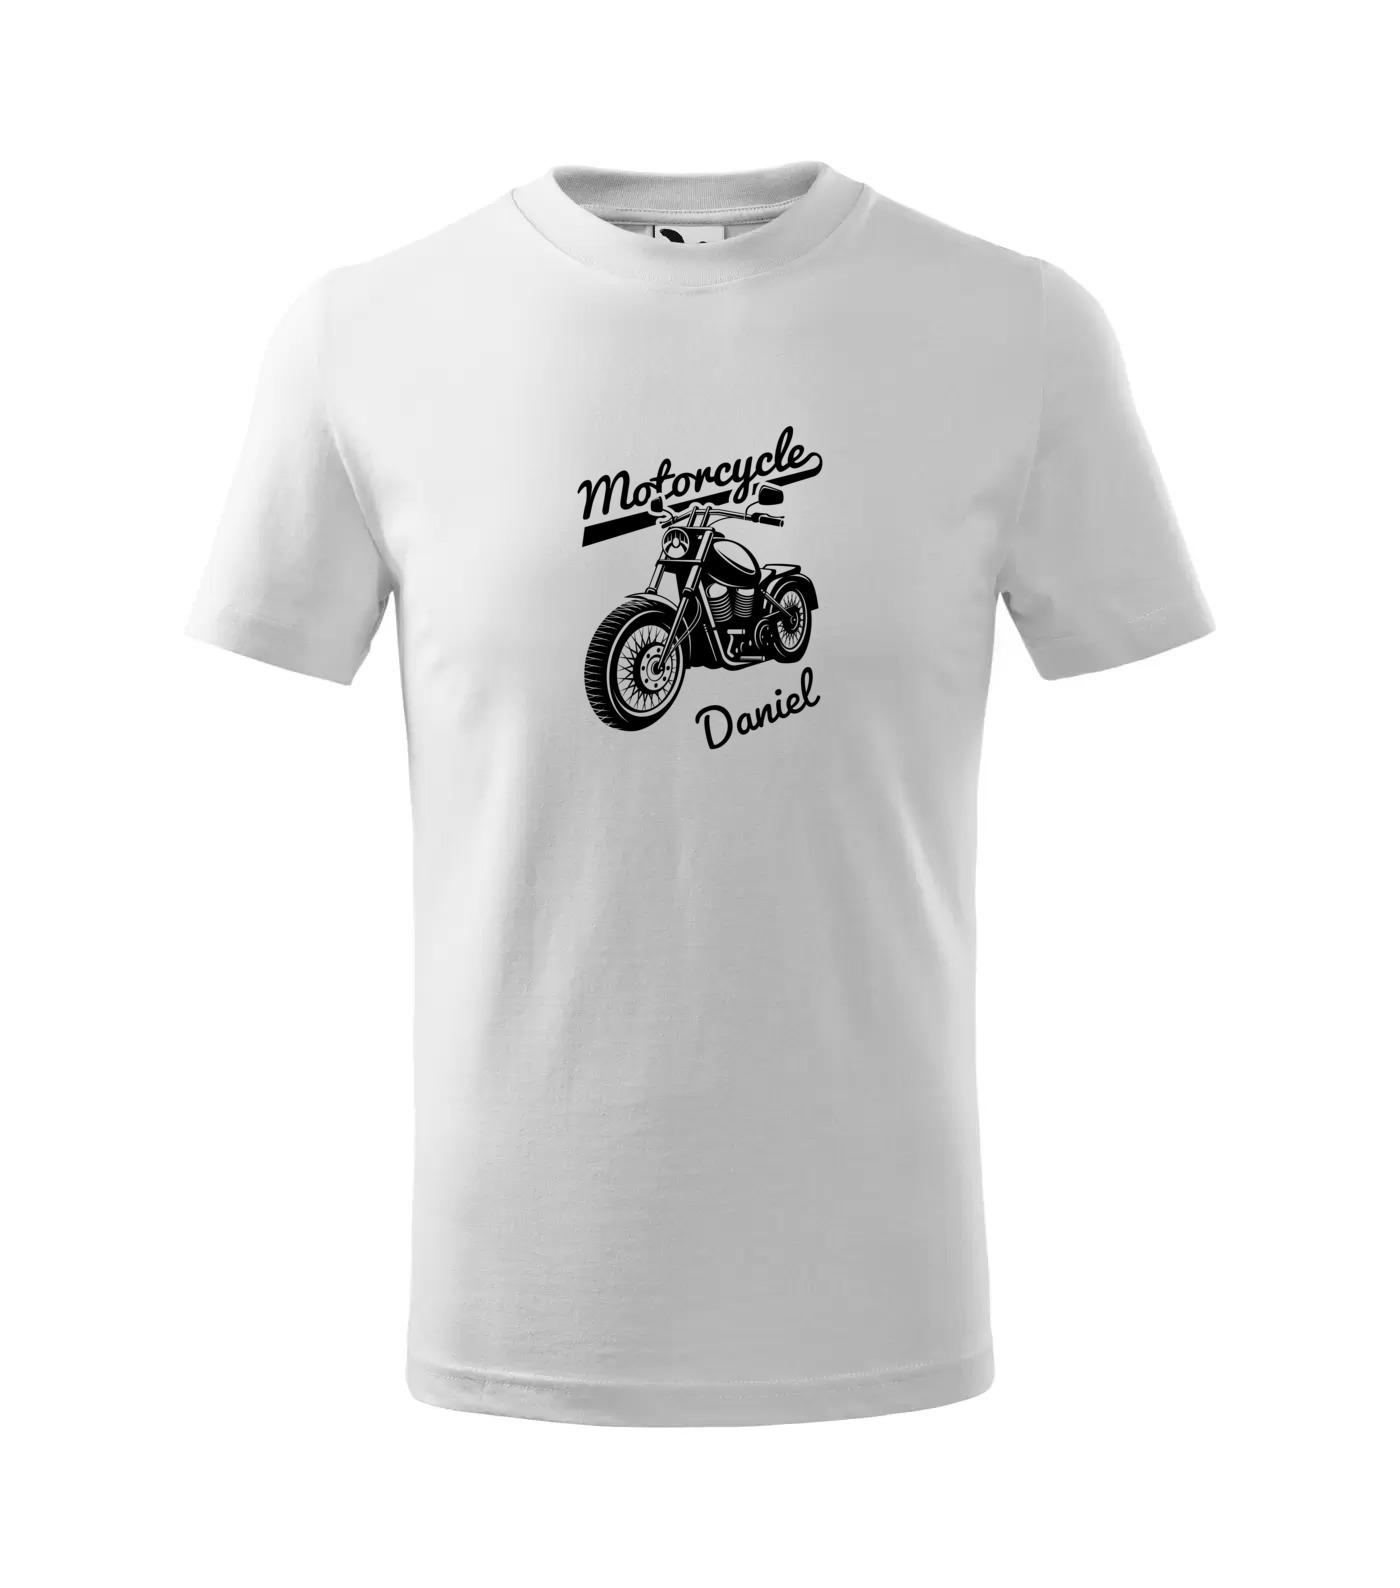 Tričko Motorkář Inverse Daniel